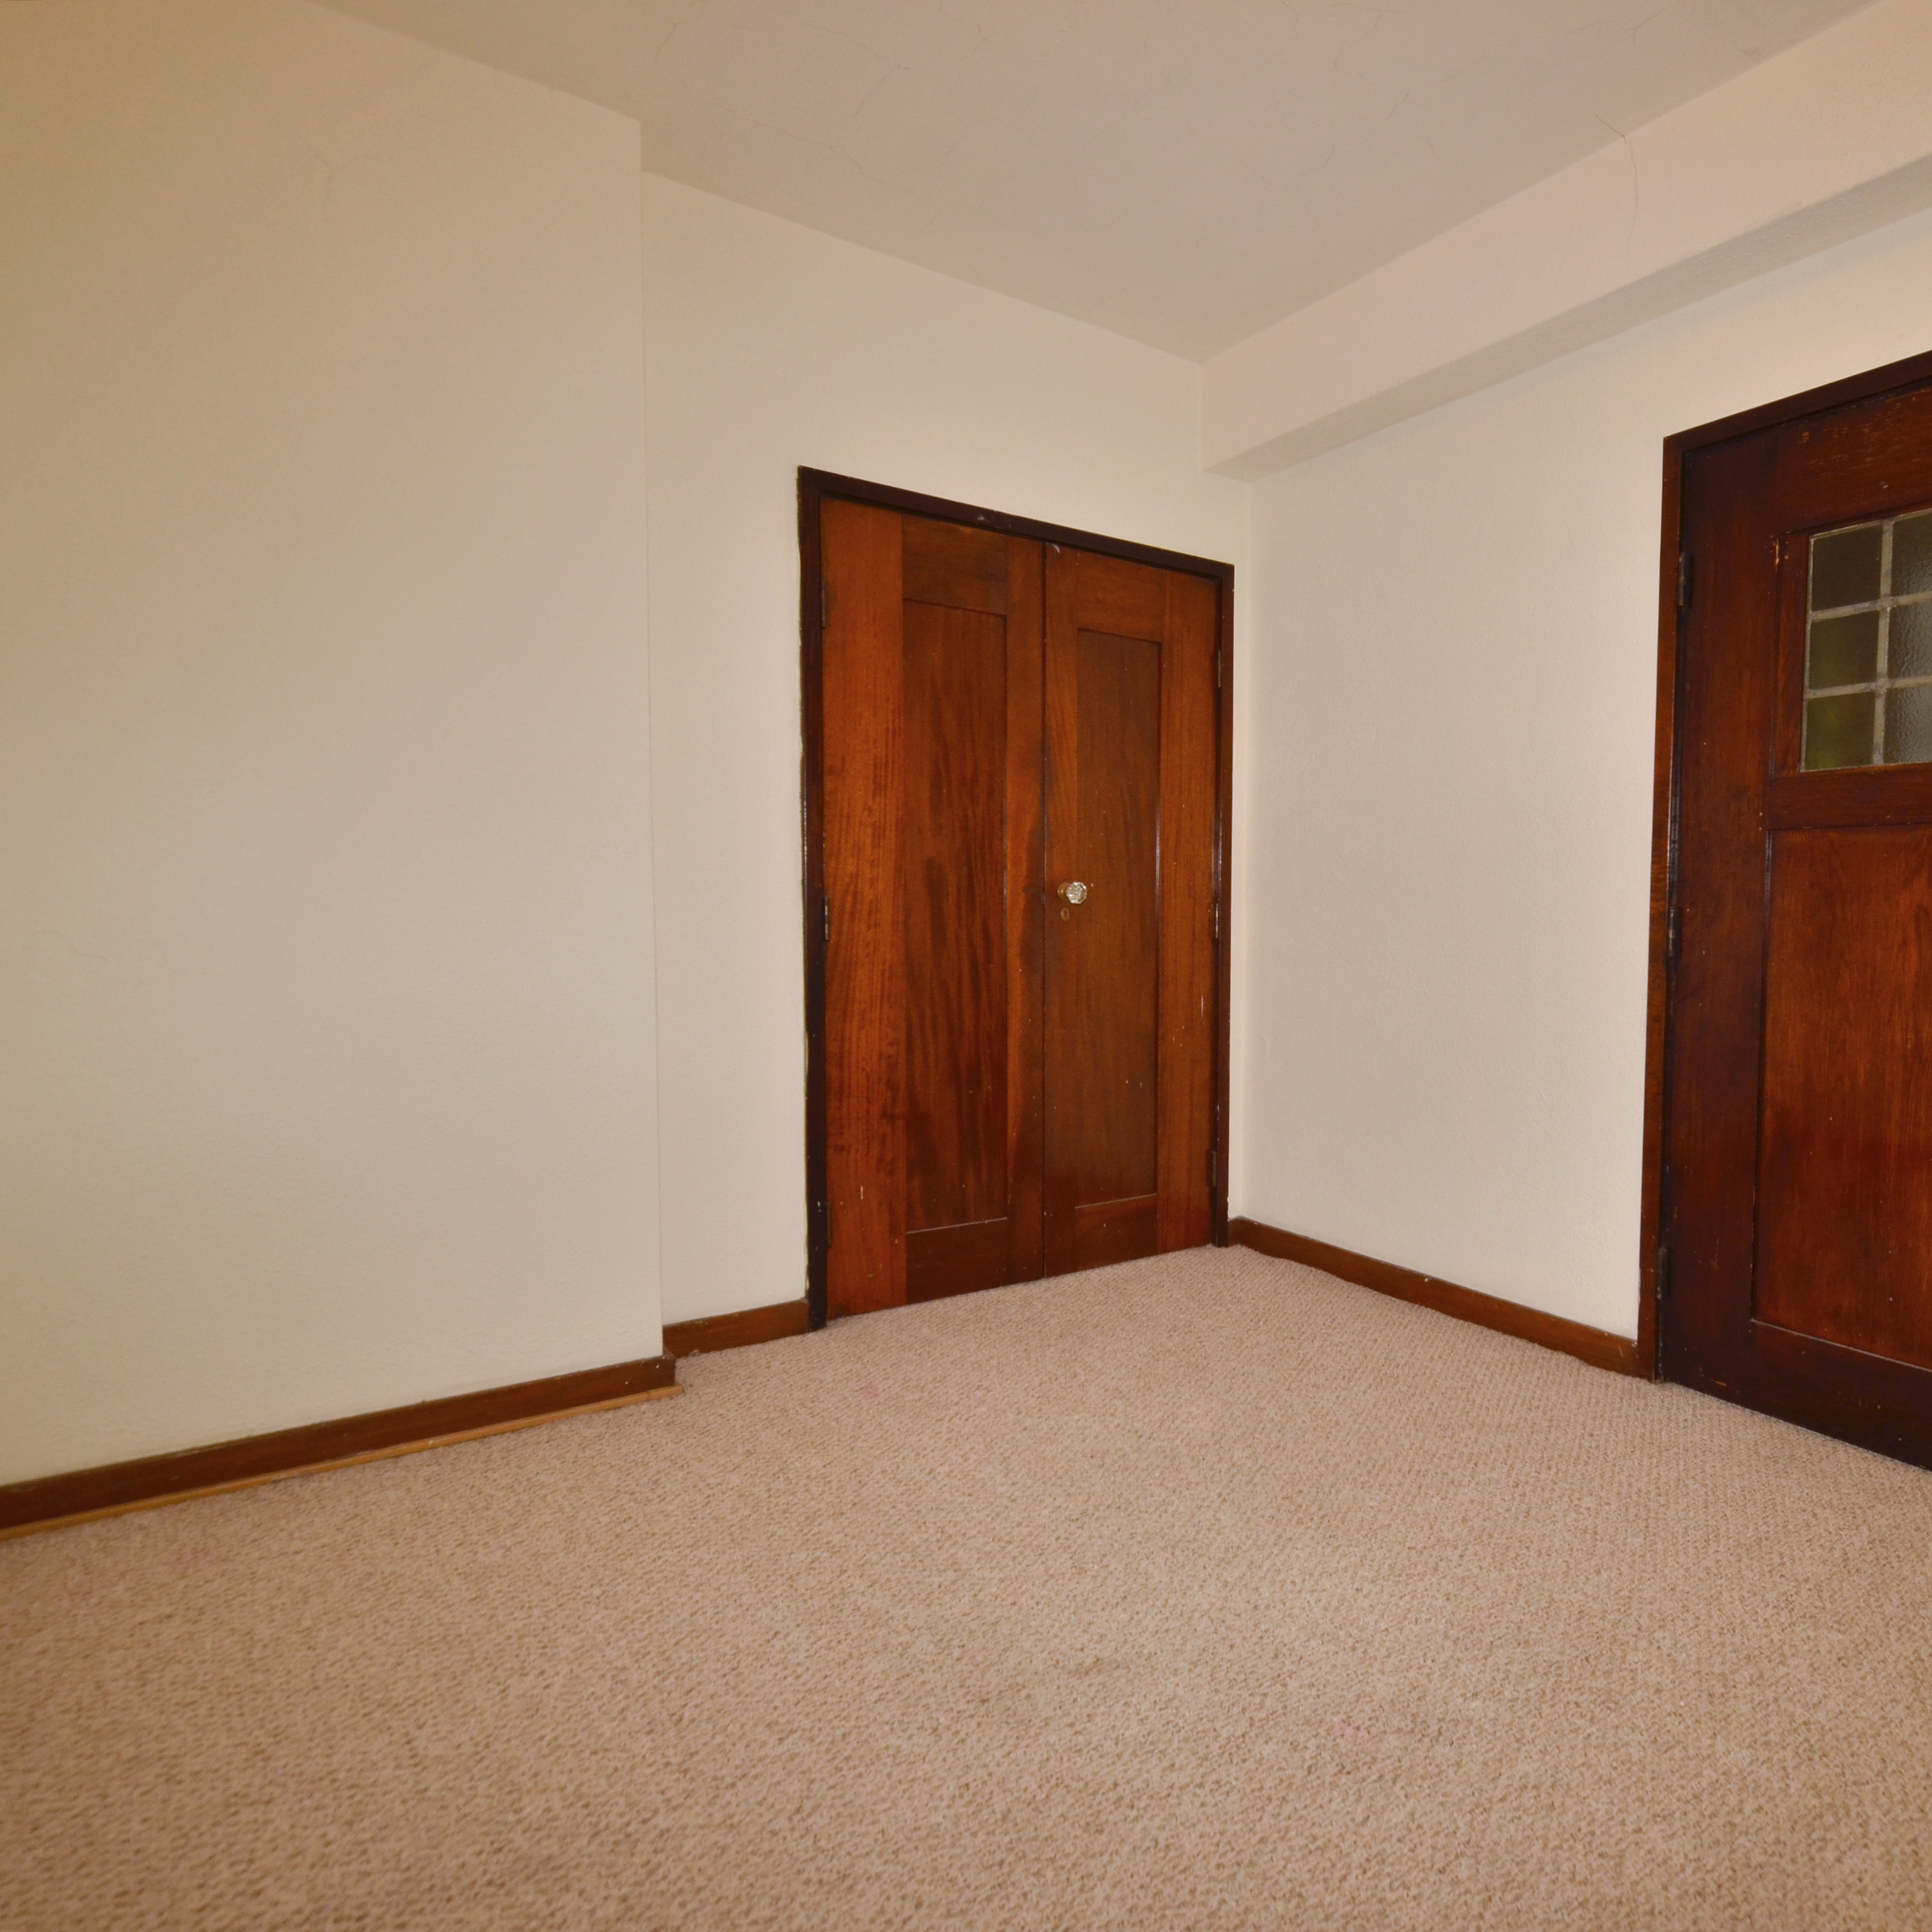 interior of 340 S. Highland Ave, Apt. 4A 4